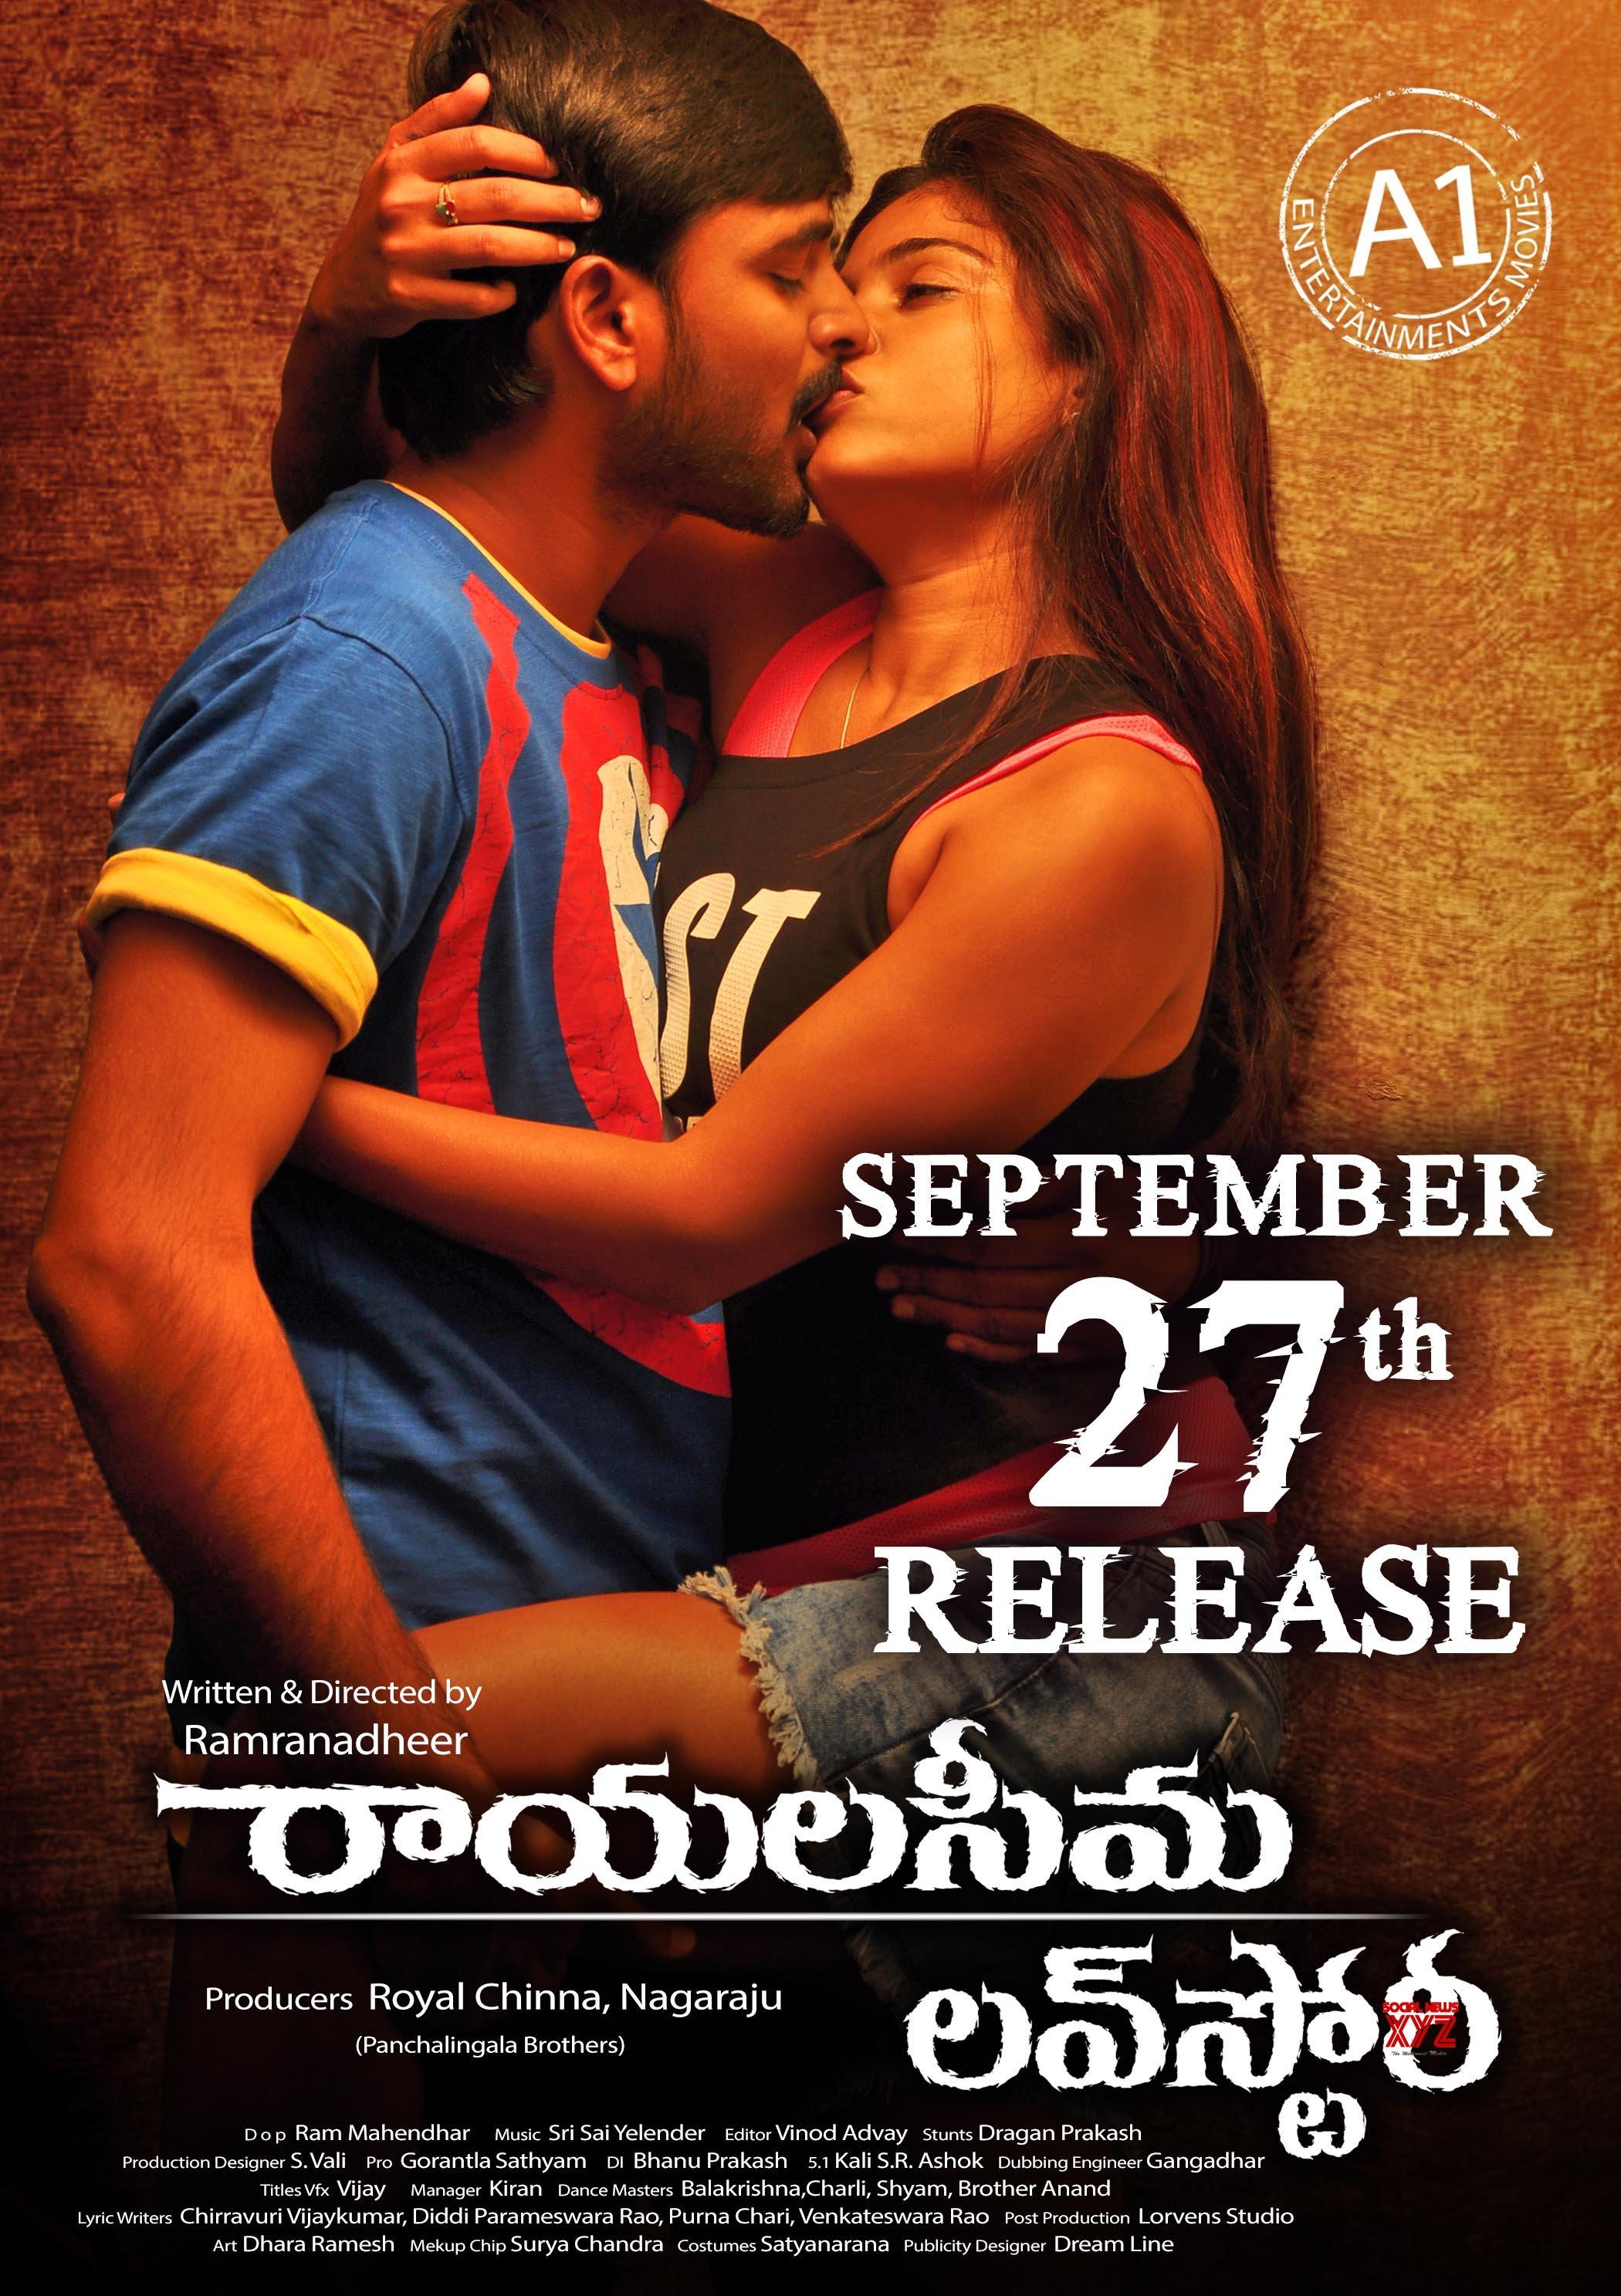 Rayalaseema Love Story Movie Hot Hd Posters Social News Xyz